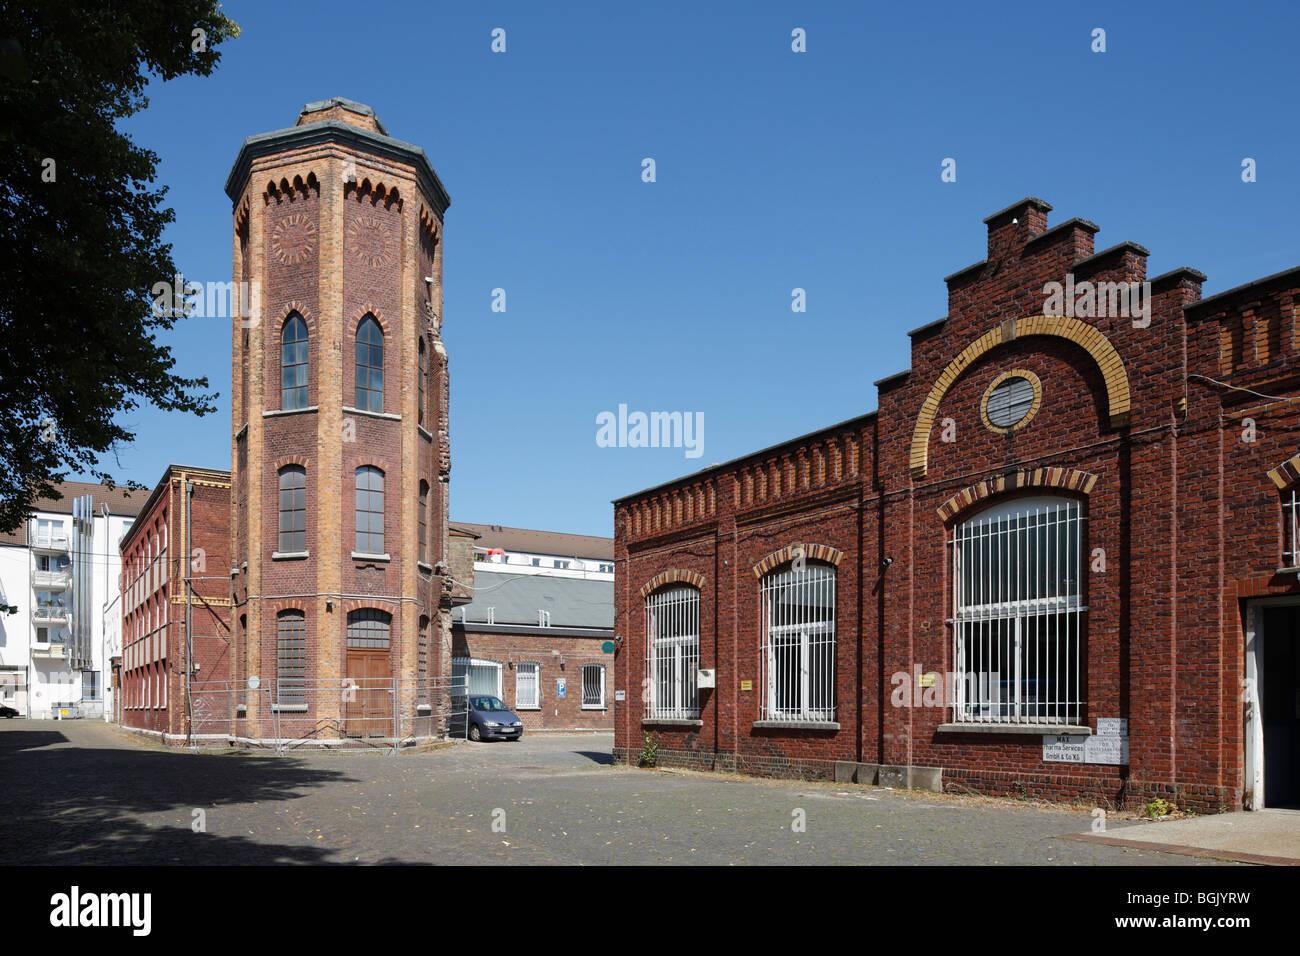 Aachen, Charlottenstrasse 14/15, Ehemalige Tuchfabrik Aachen, Wasserturm - Stock Image